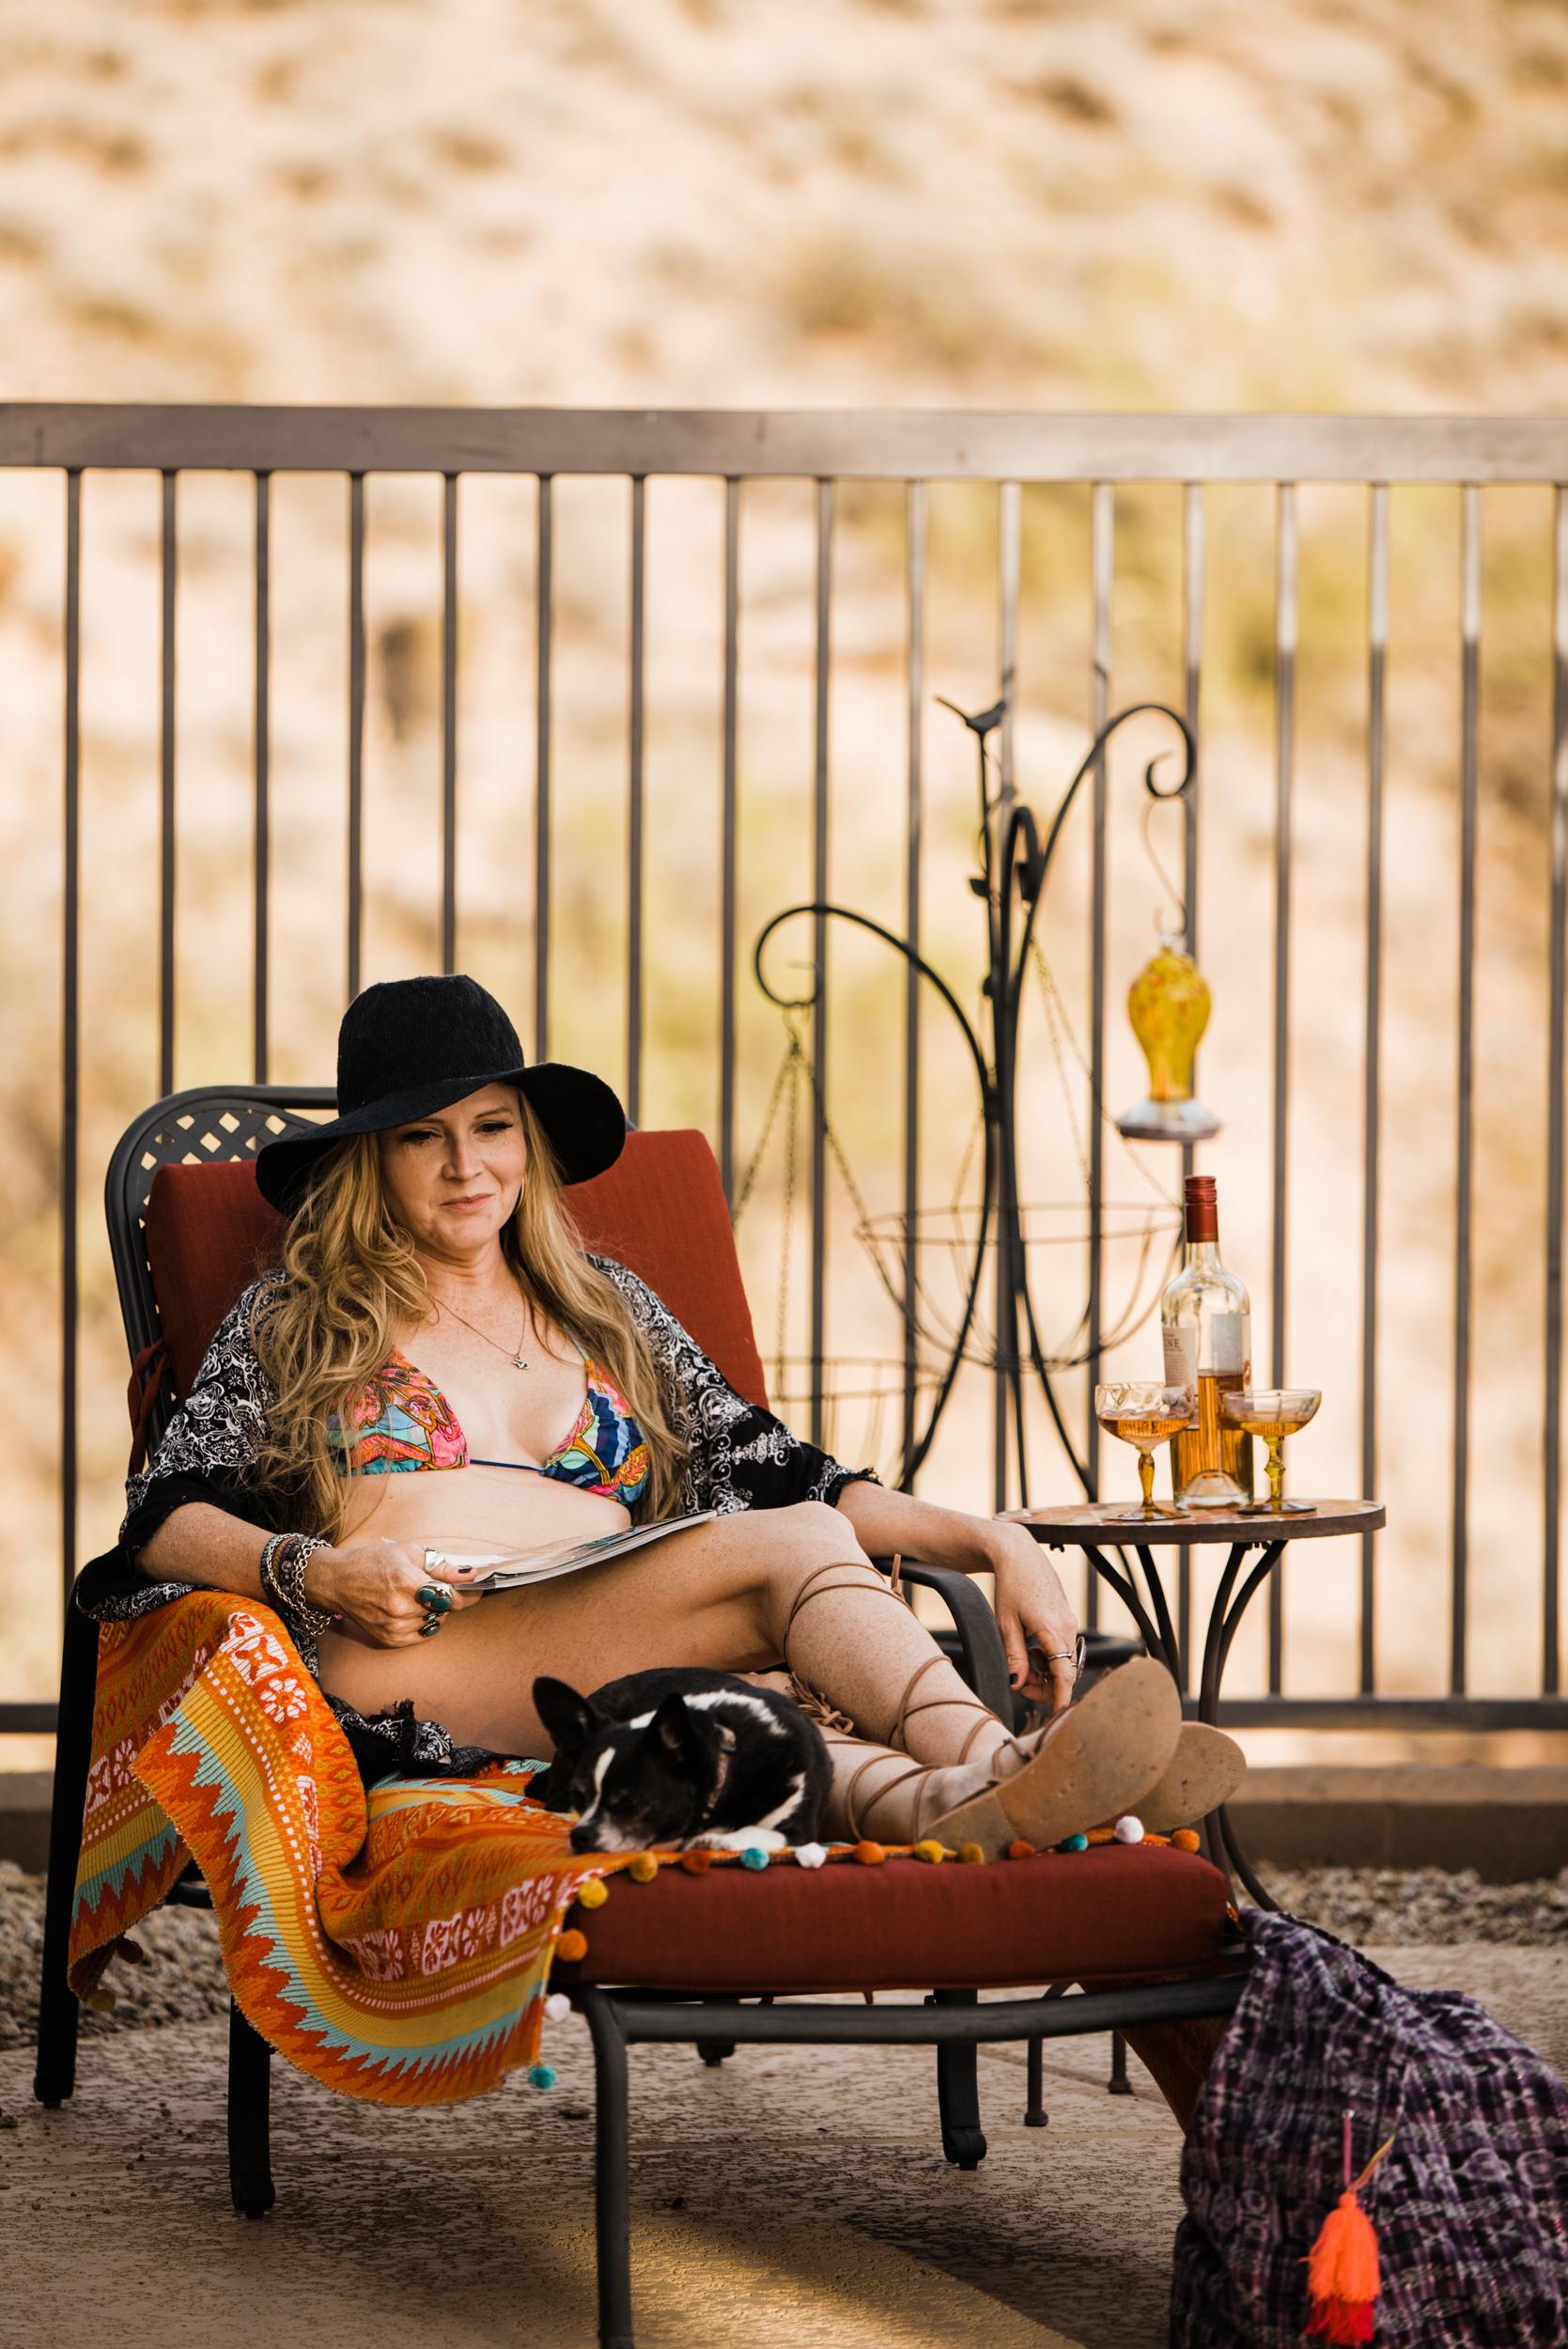 Arizona-love-hippie-momma-bags-boho-5.jpg